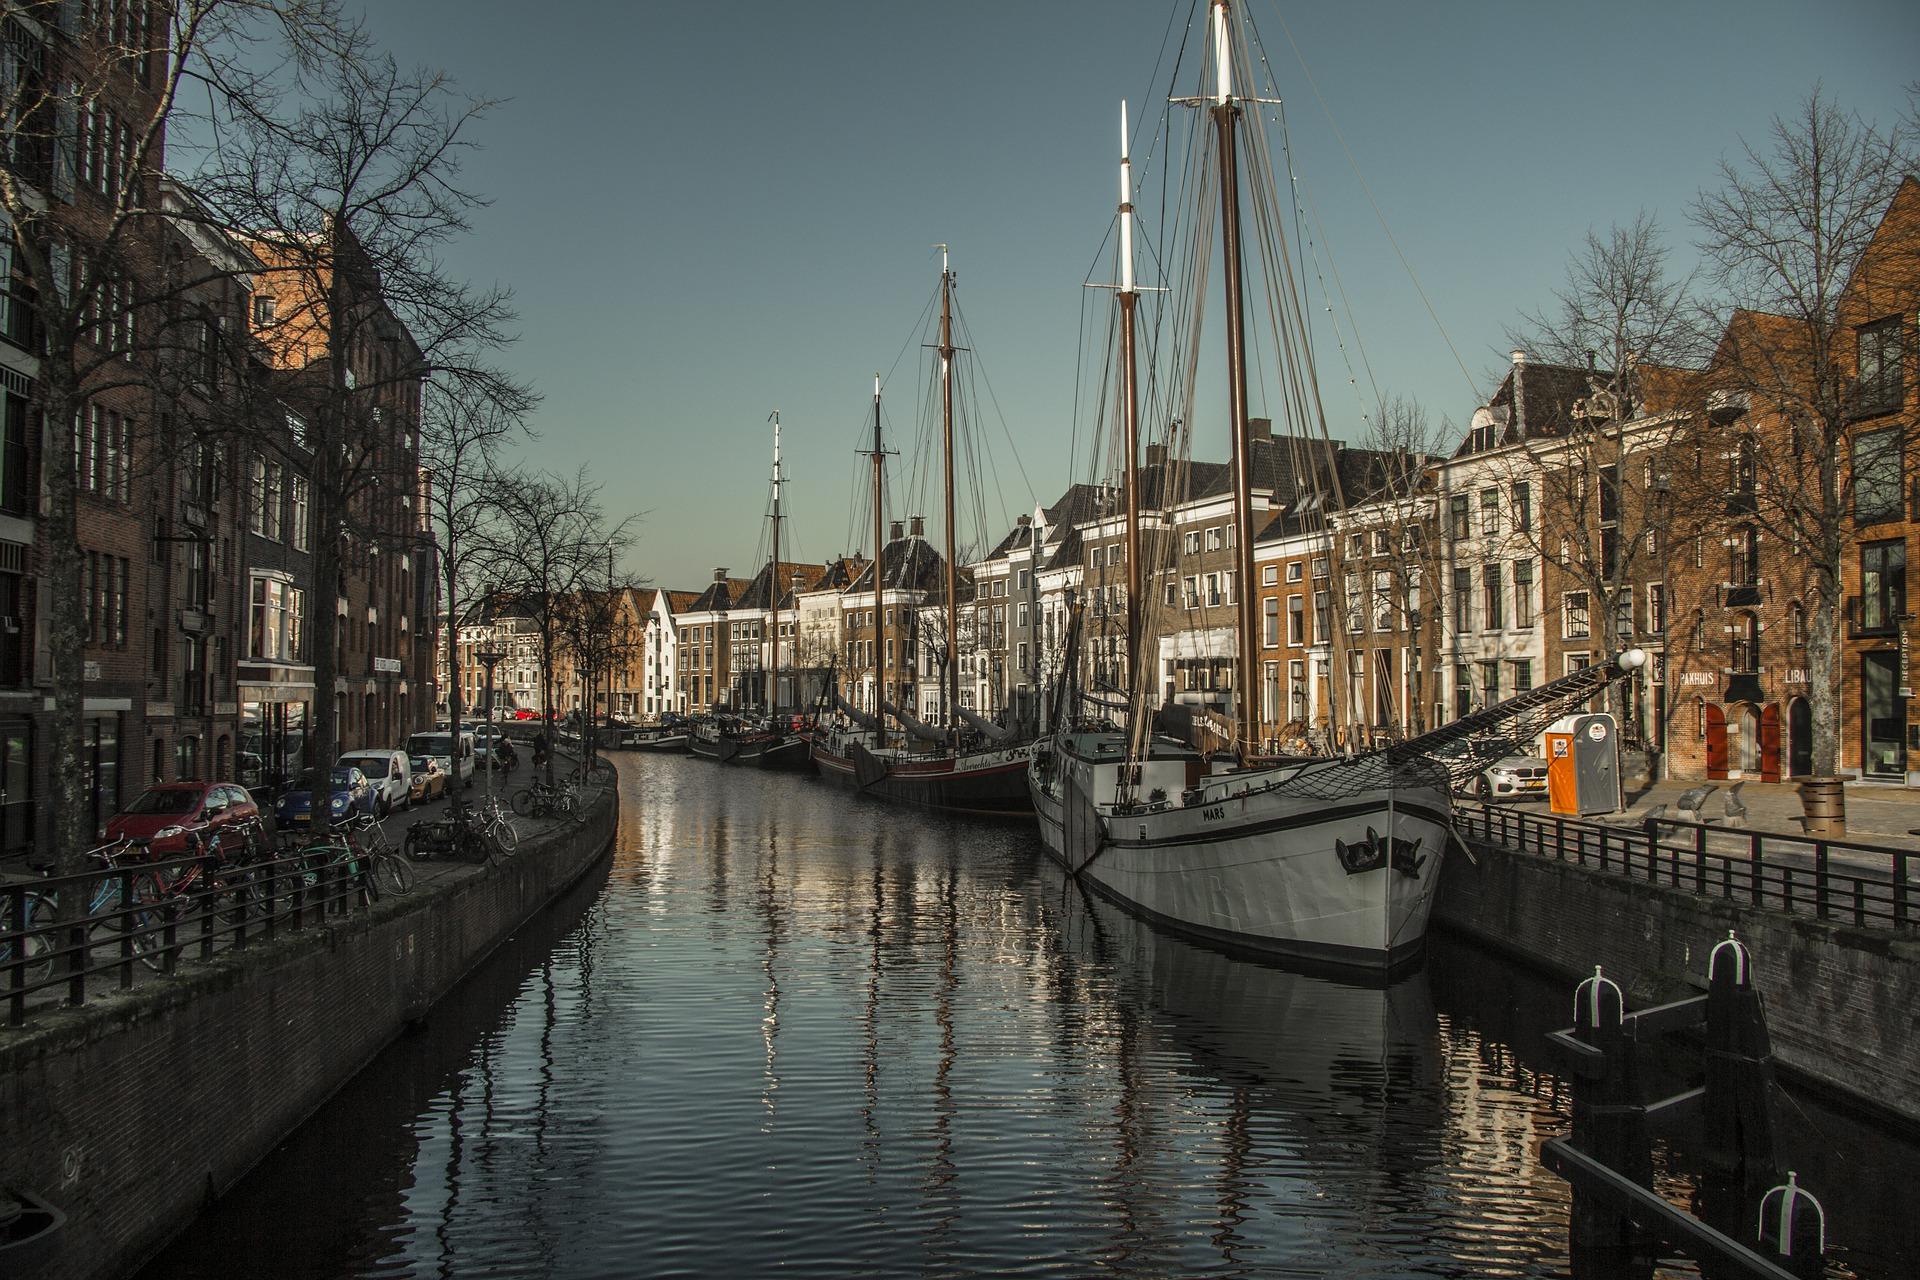 Kanal yang cantik di Belanda - Sumber foto: Mel (Pixabay)